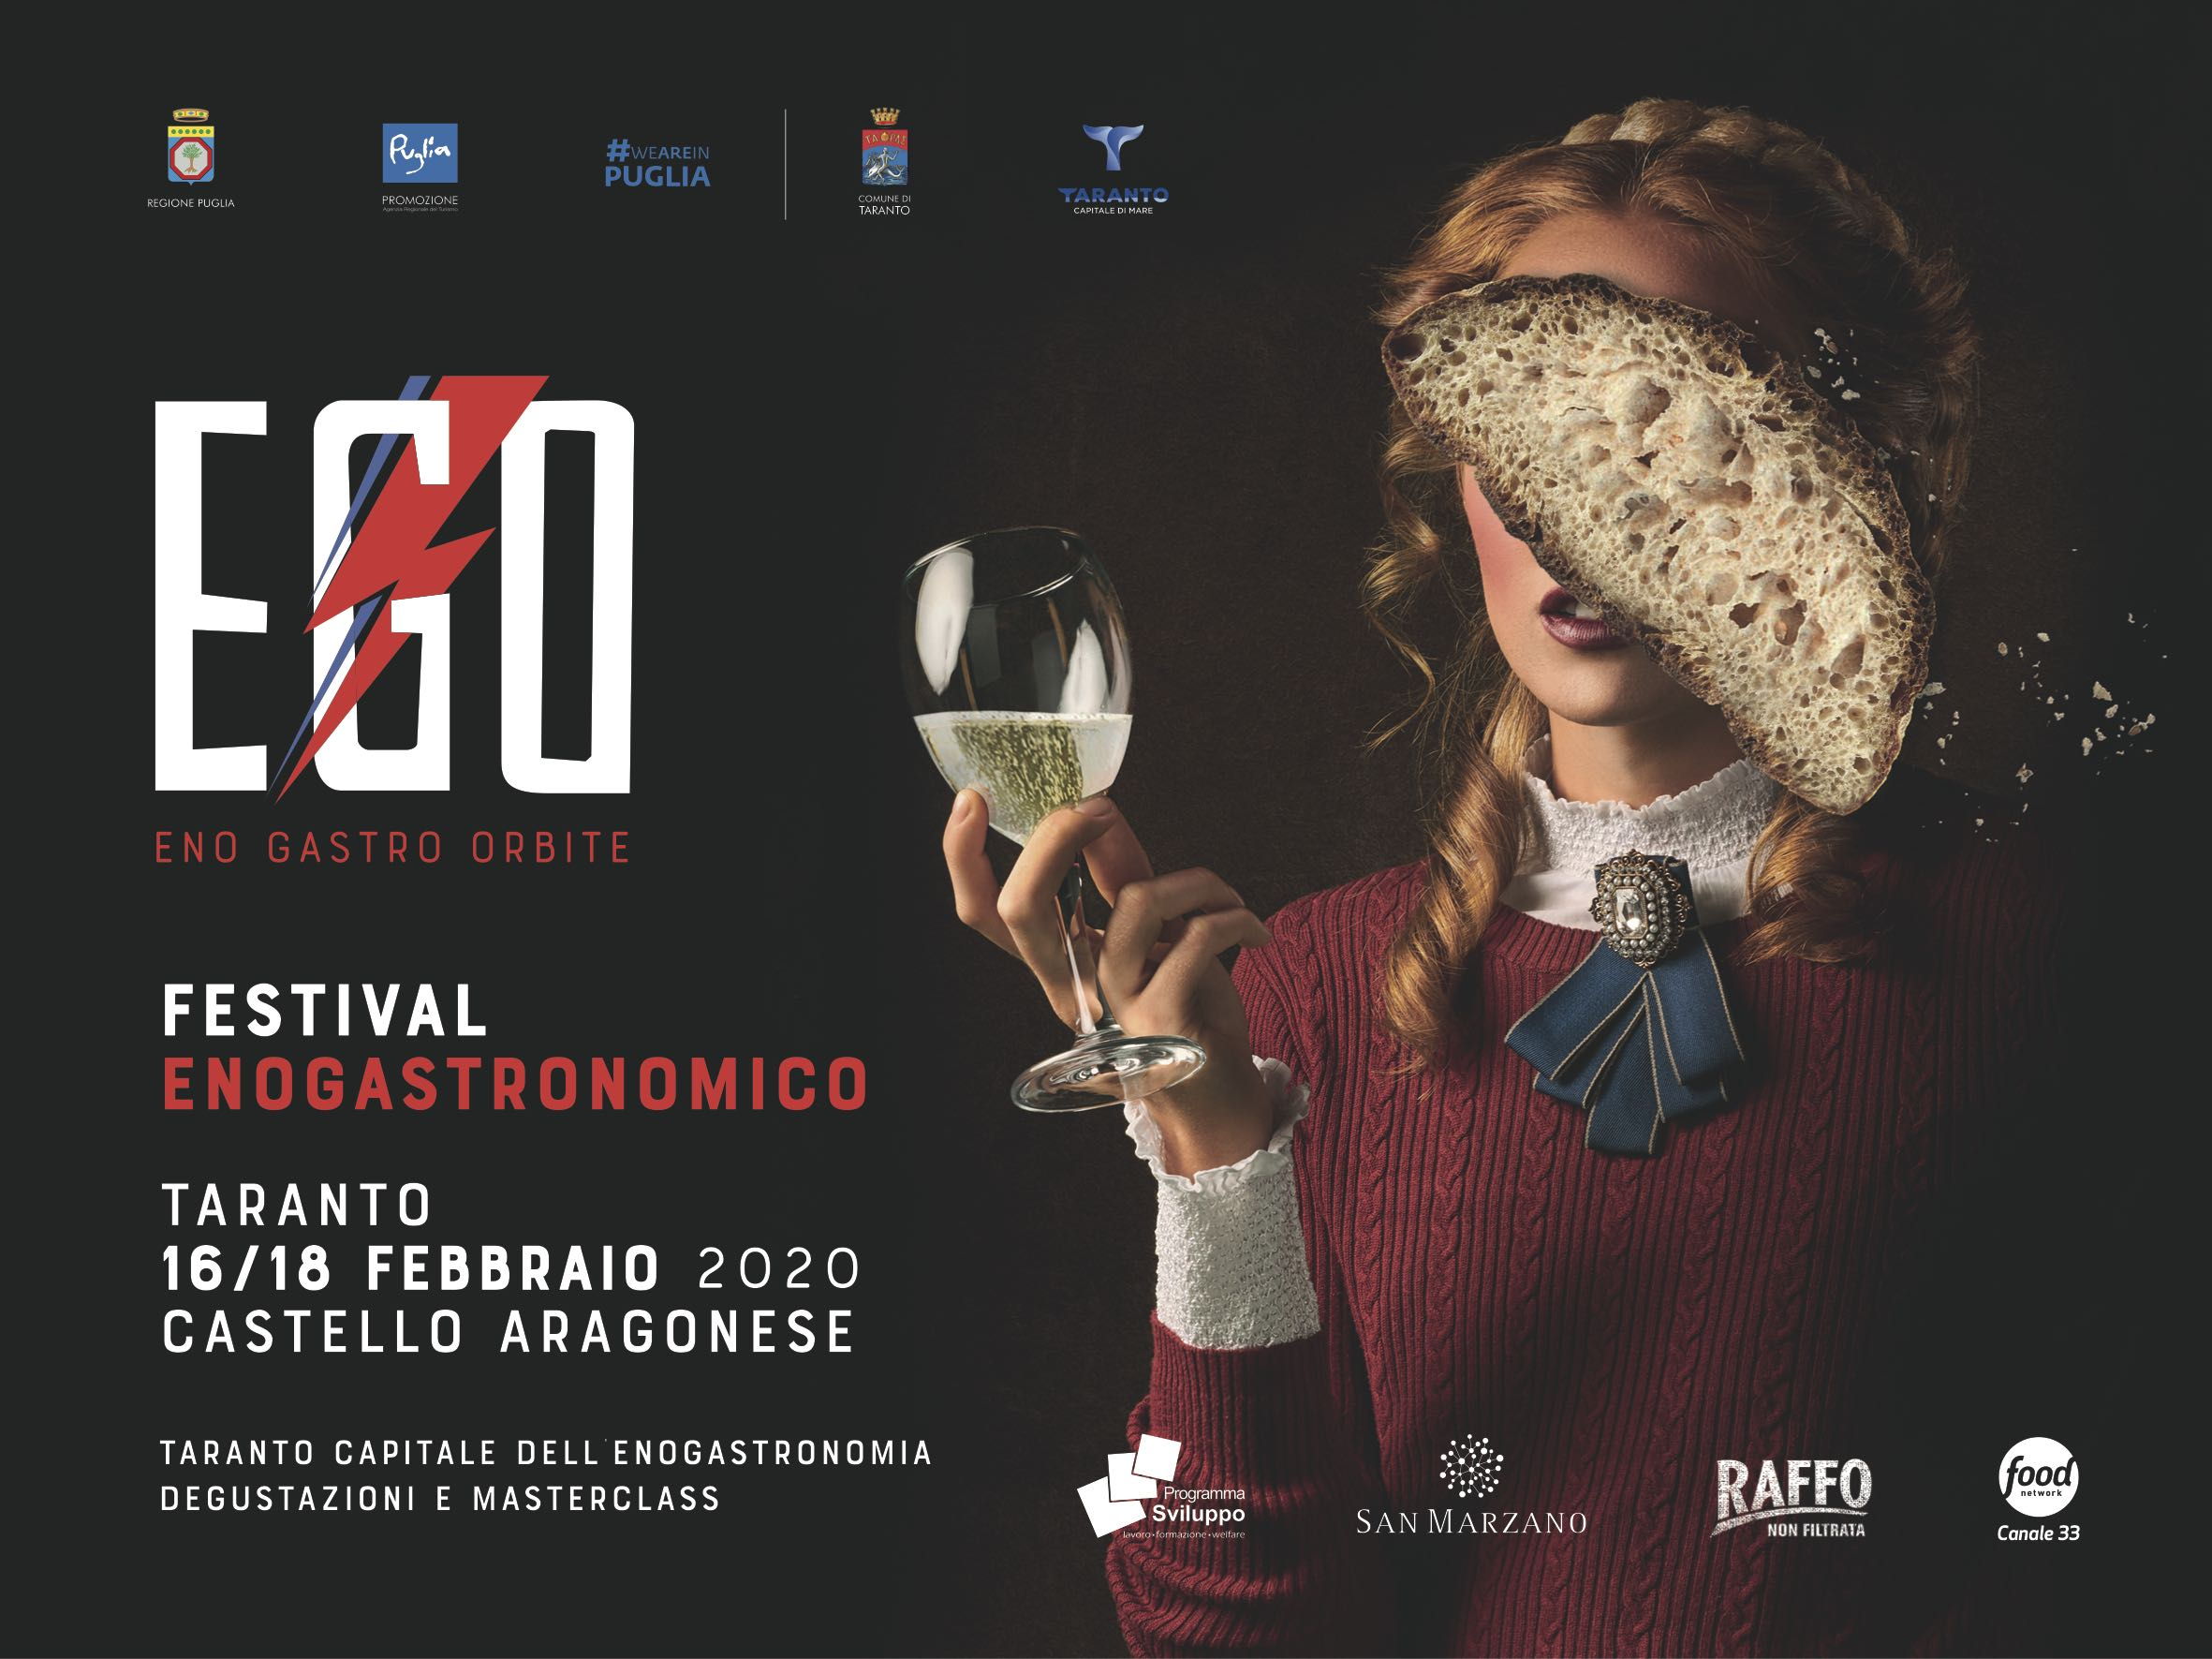 ego festival